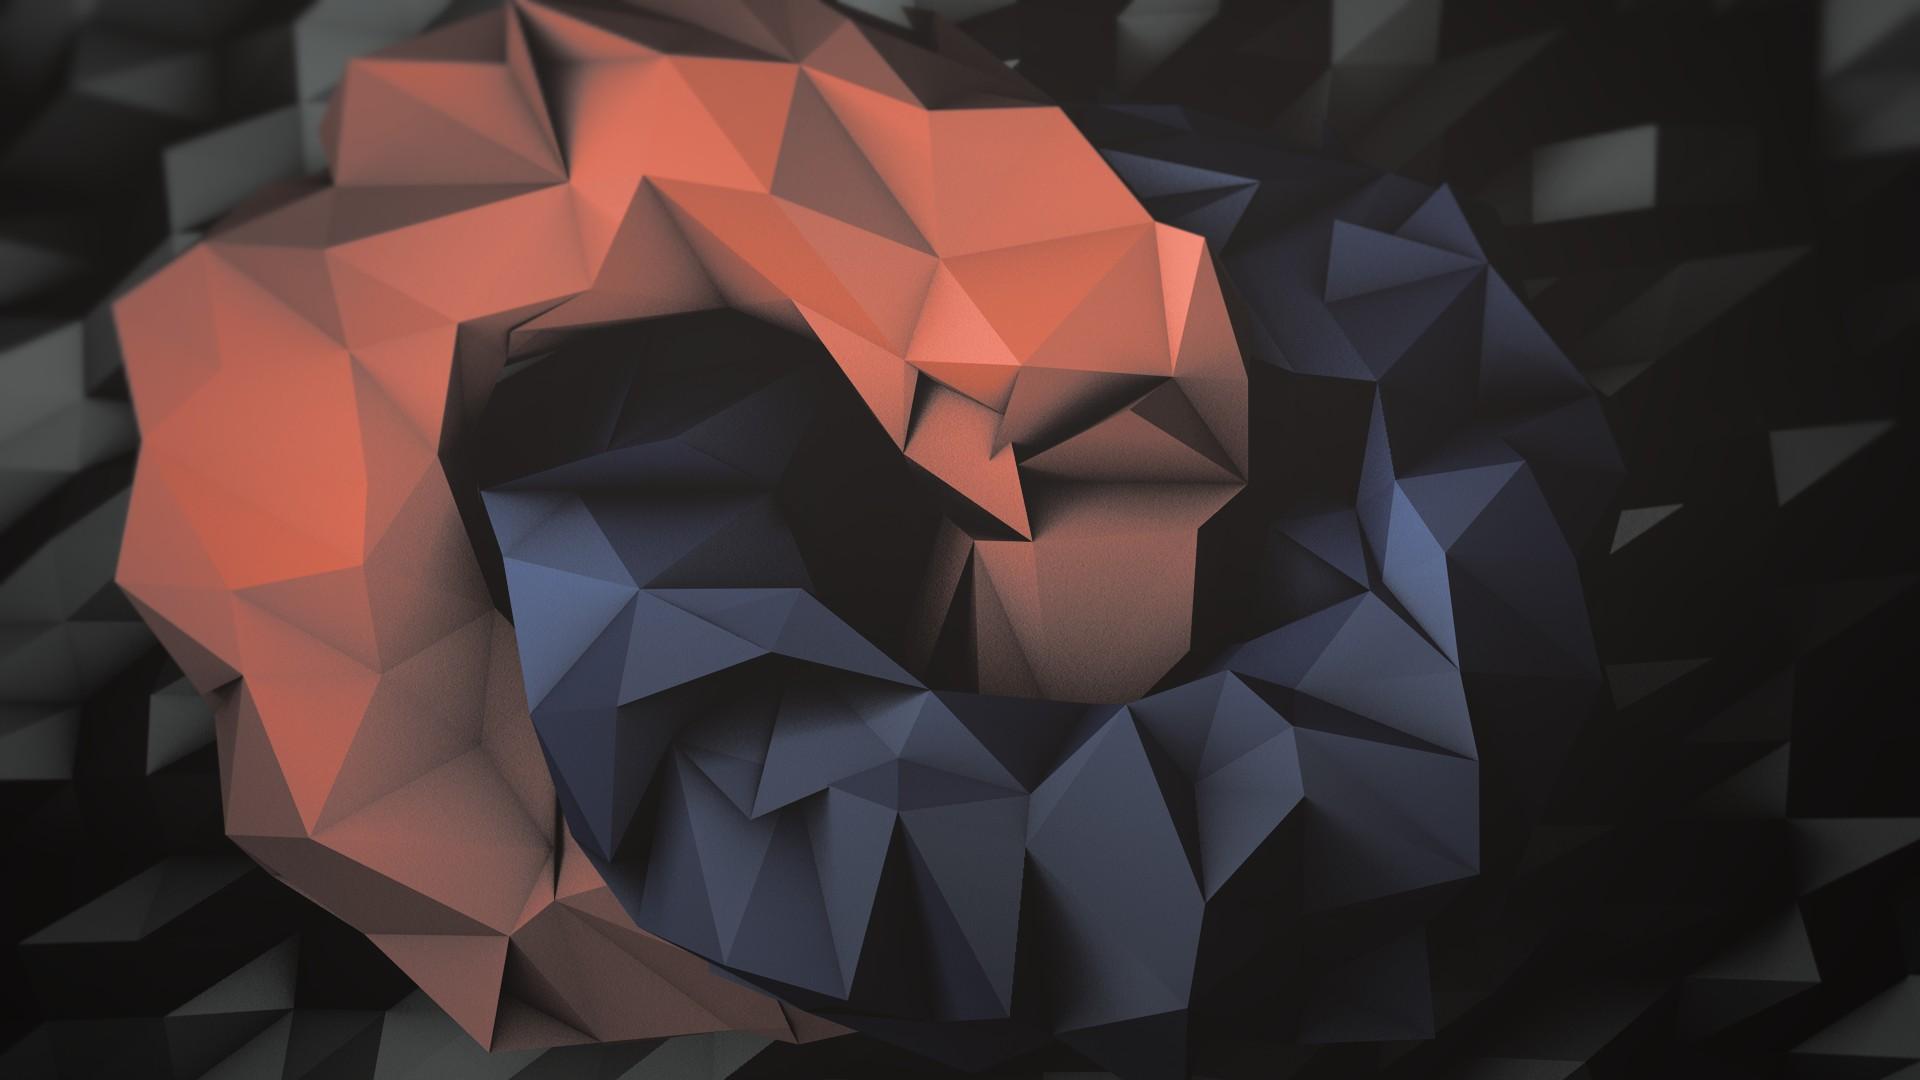 Wallpaper 1920x1080 Px 3d Abstract Art Polygon 1920x1080